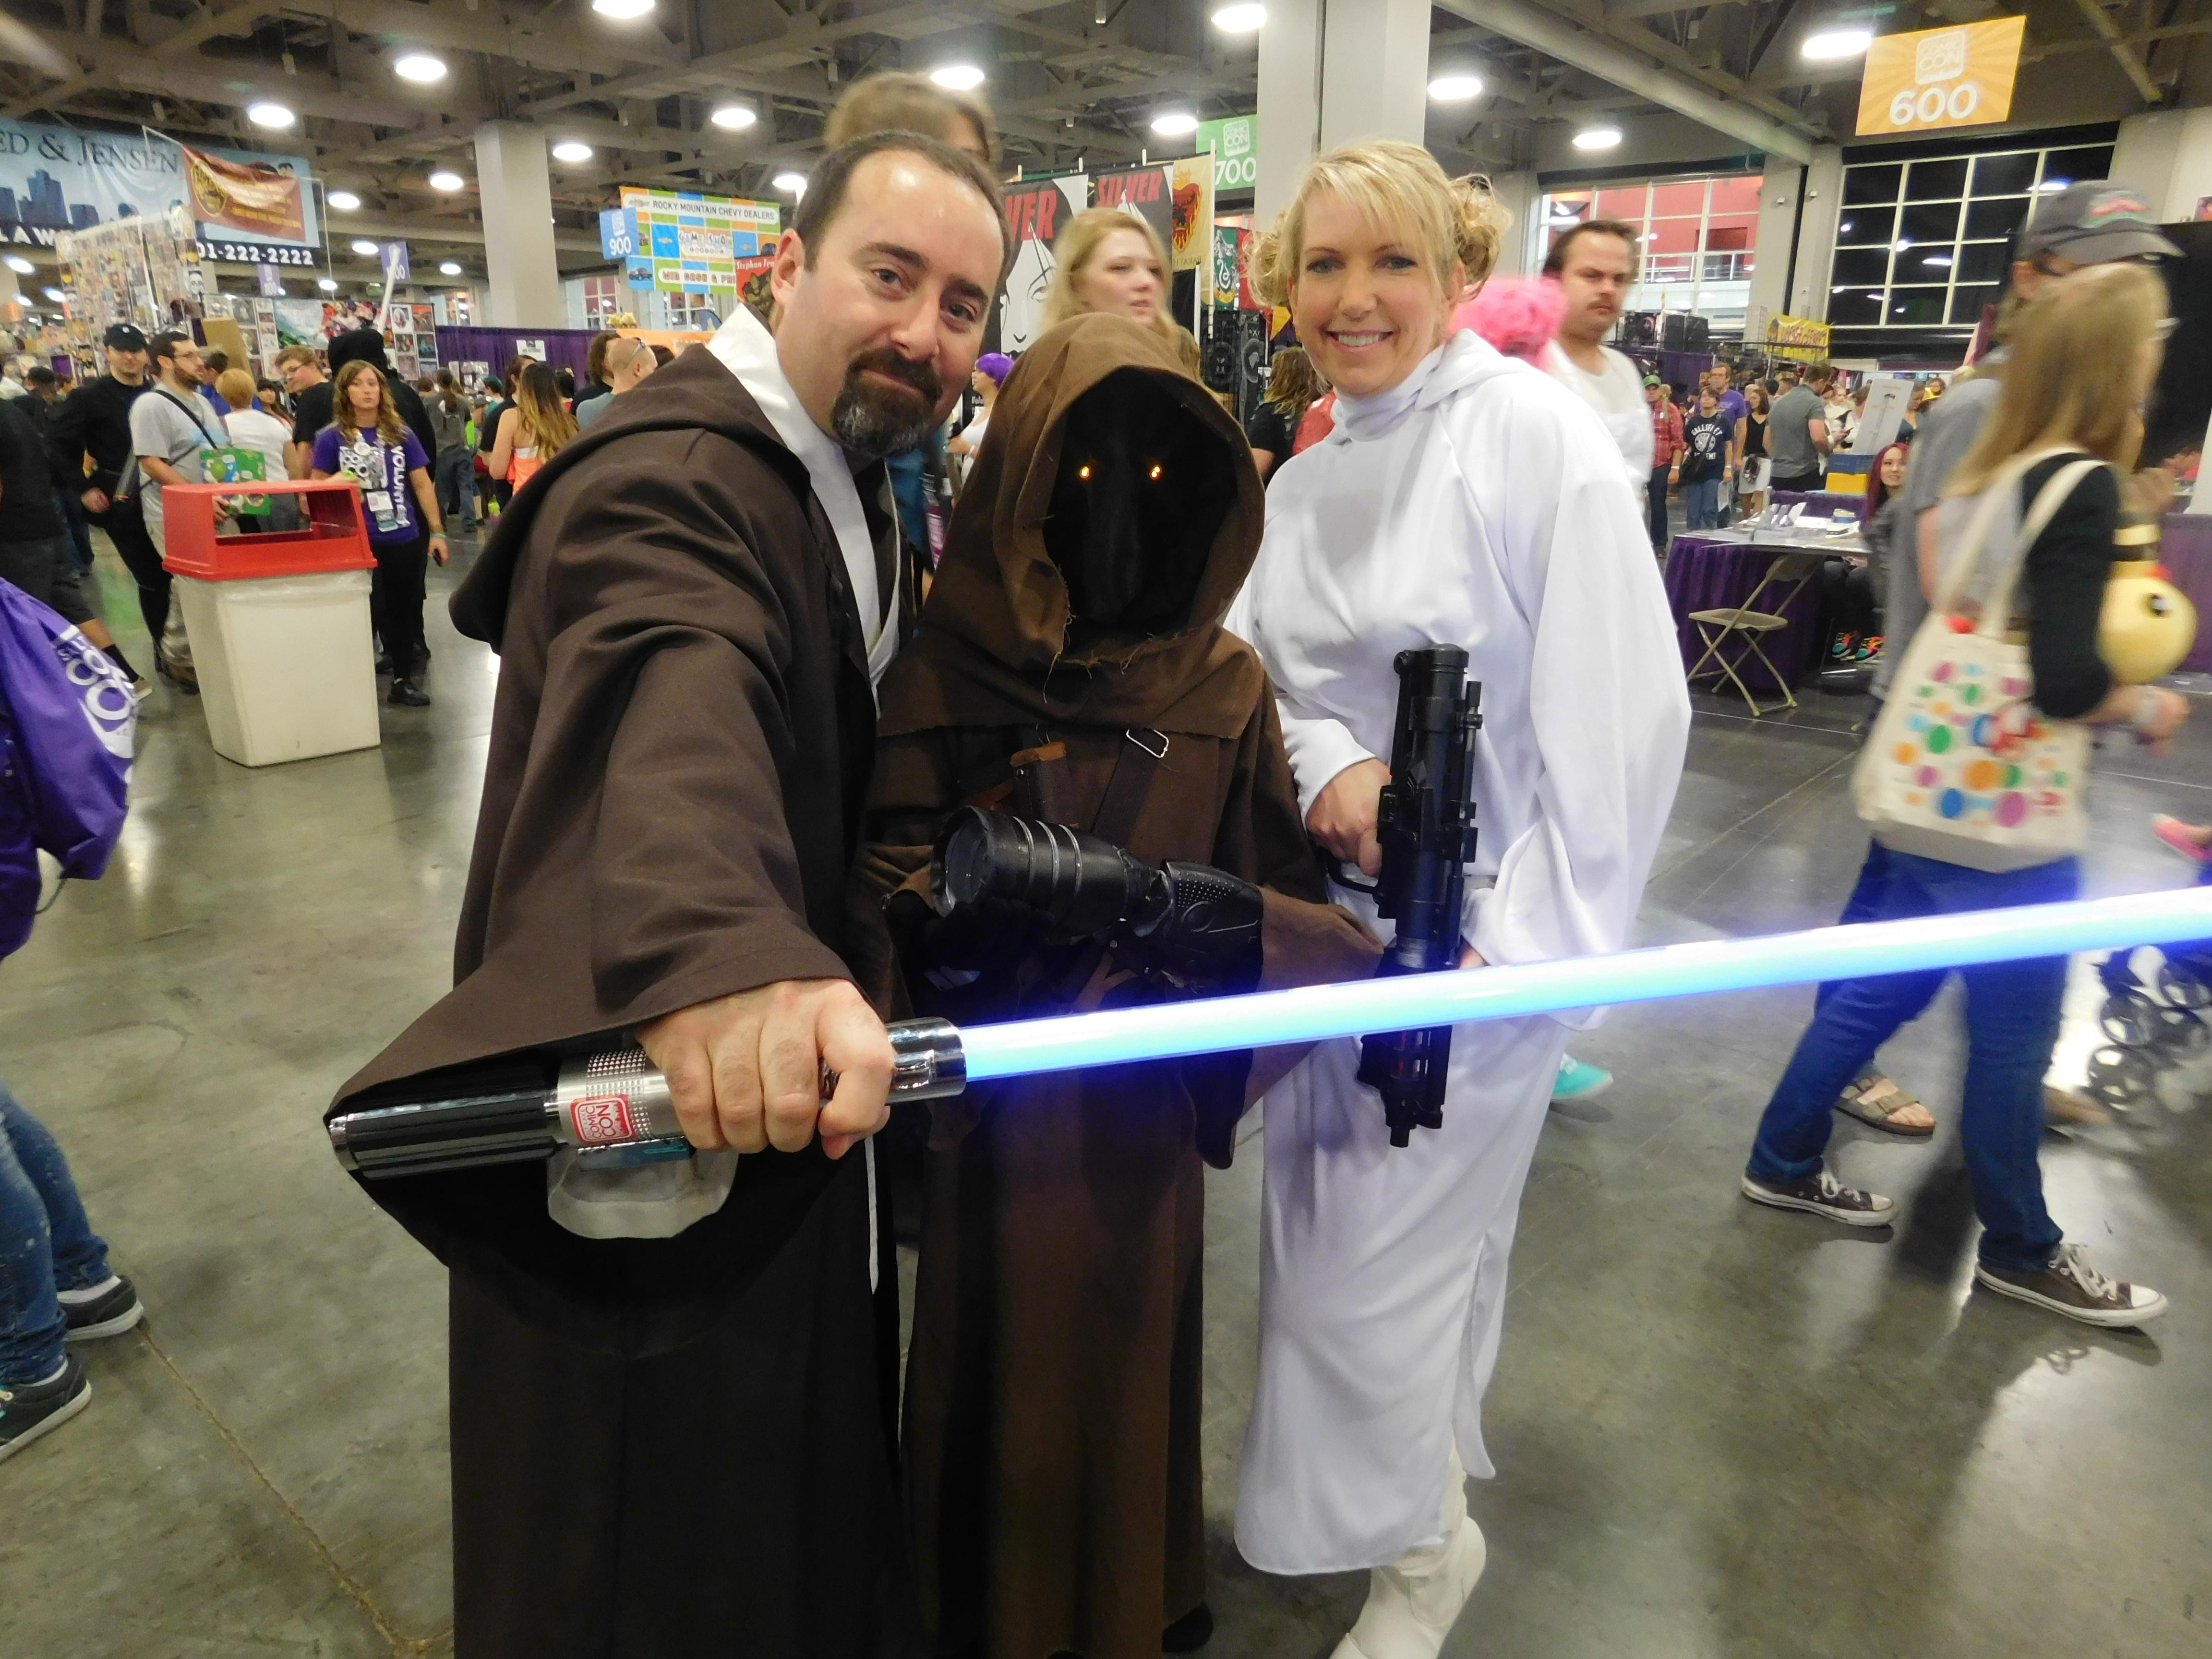 SLCCd3.013 - Star Wars fans UNITE!